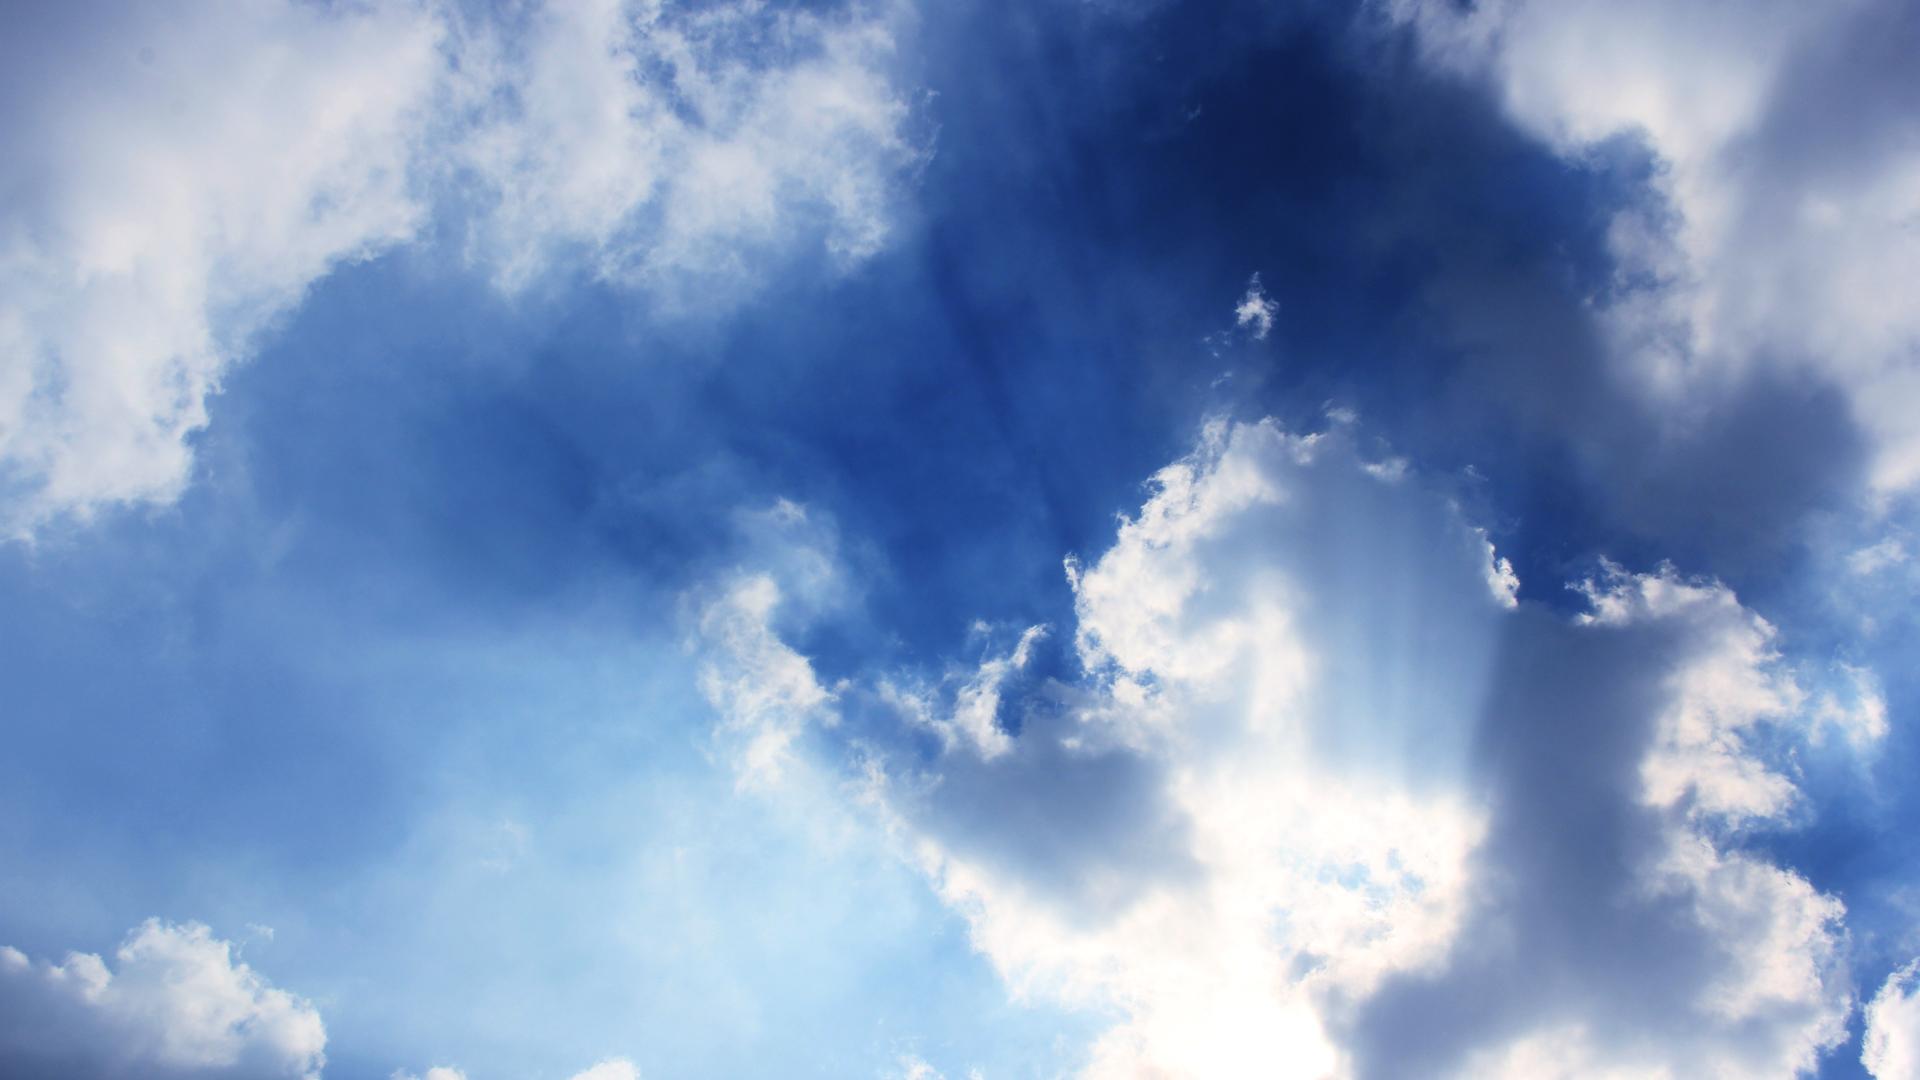 sky clouds wallpaper hd